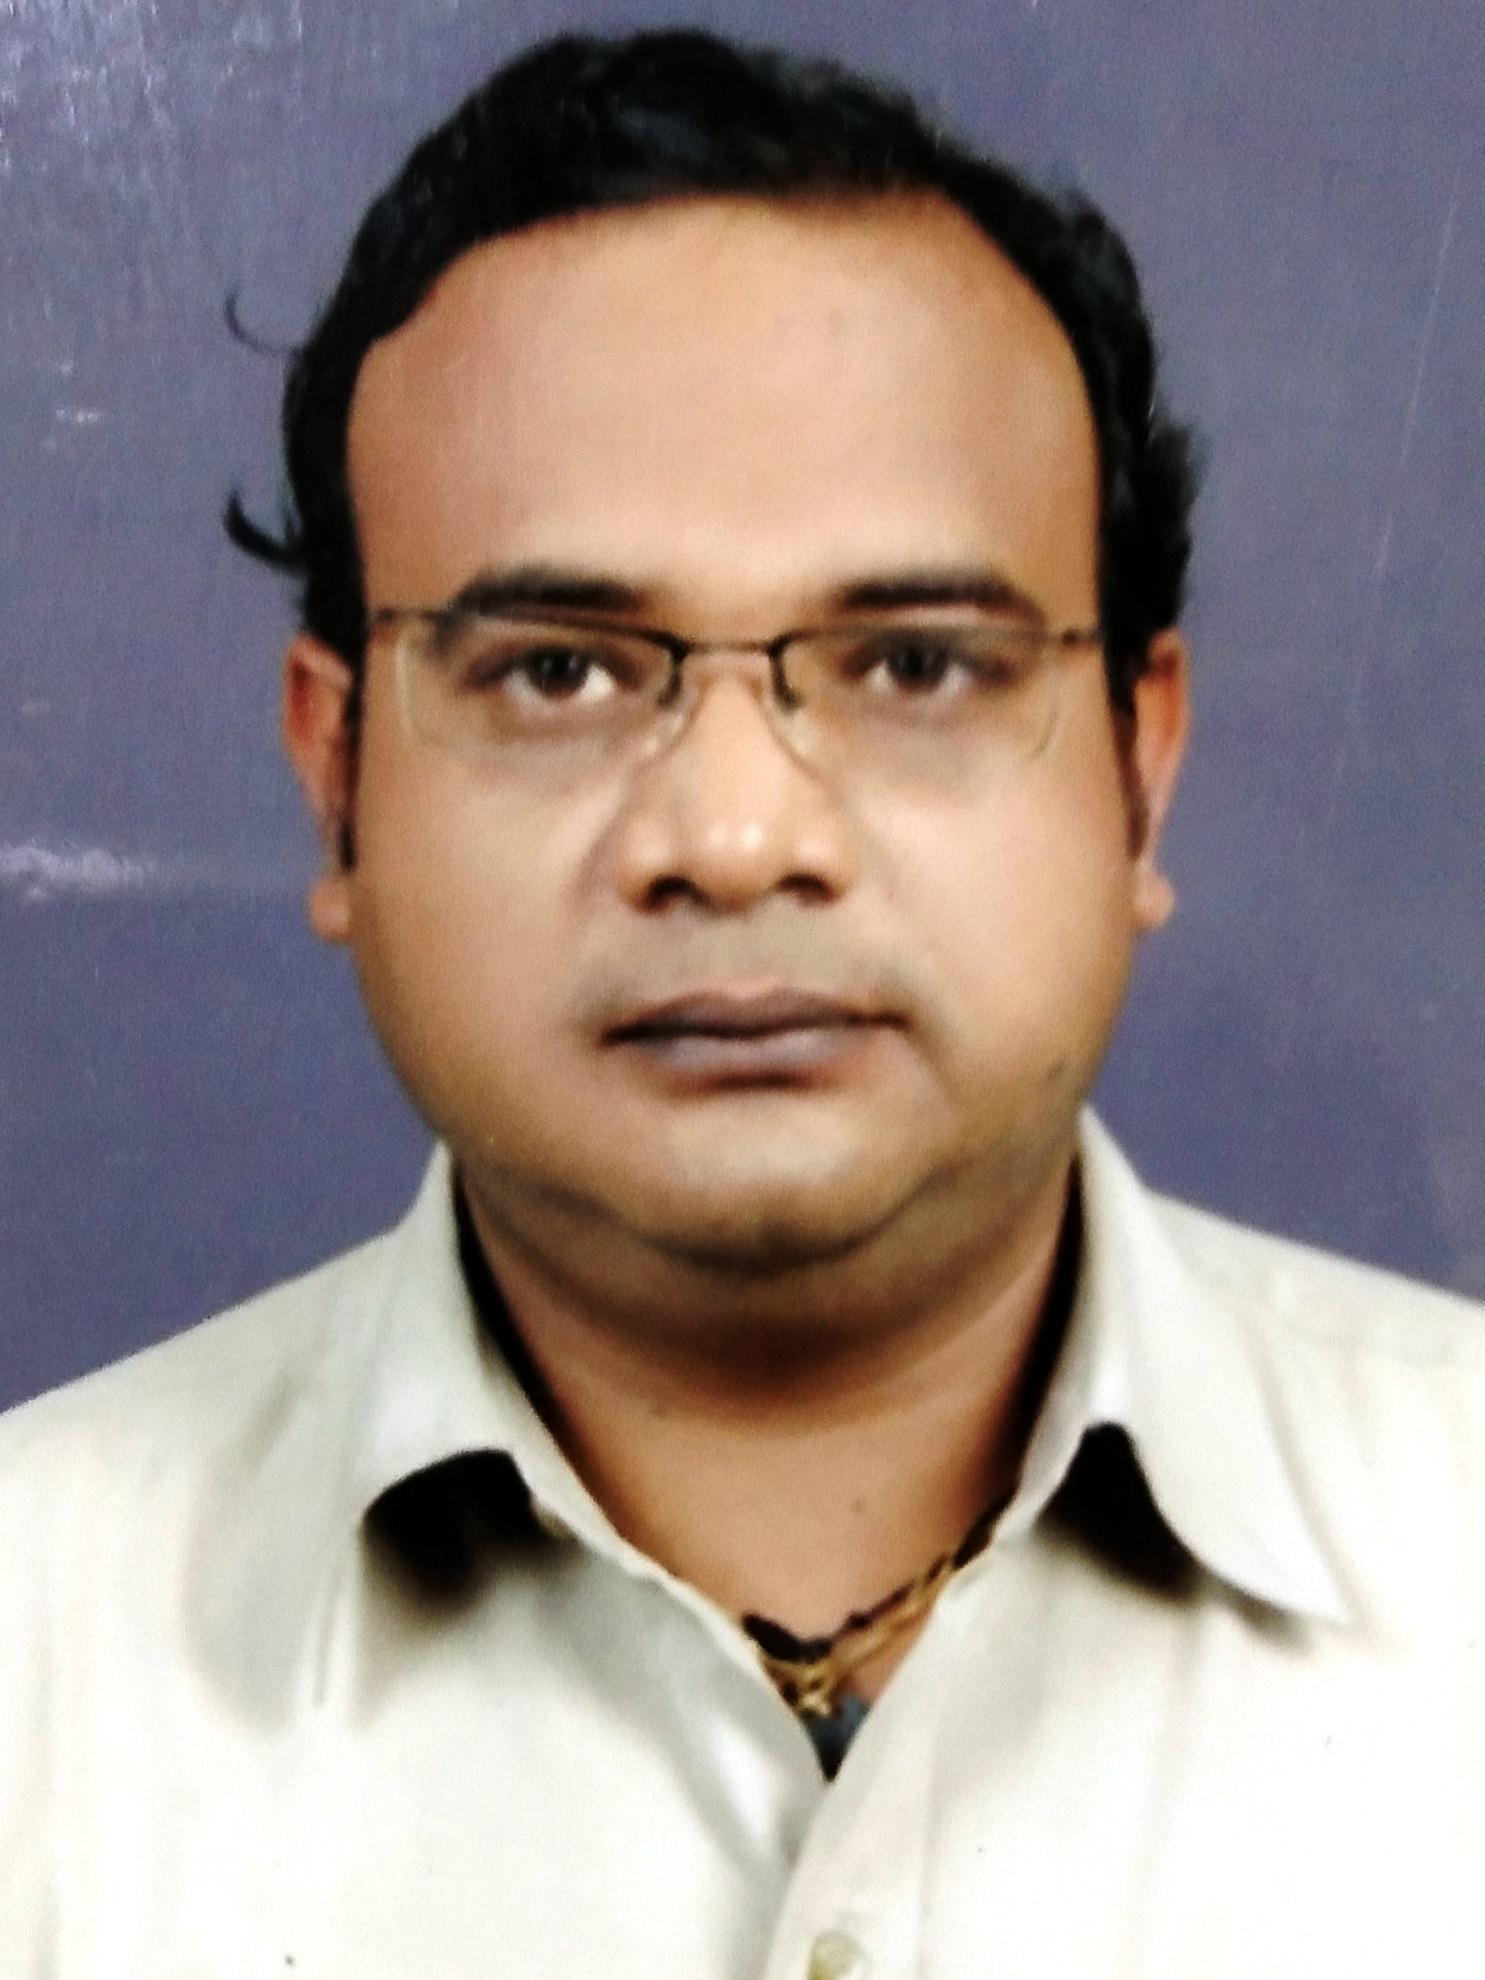 MR. RAVI KUSHWAH